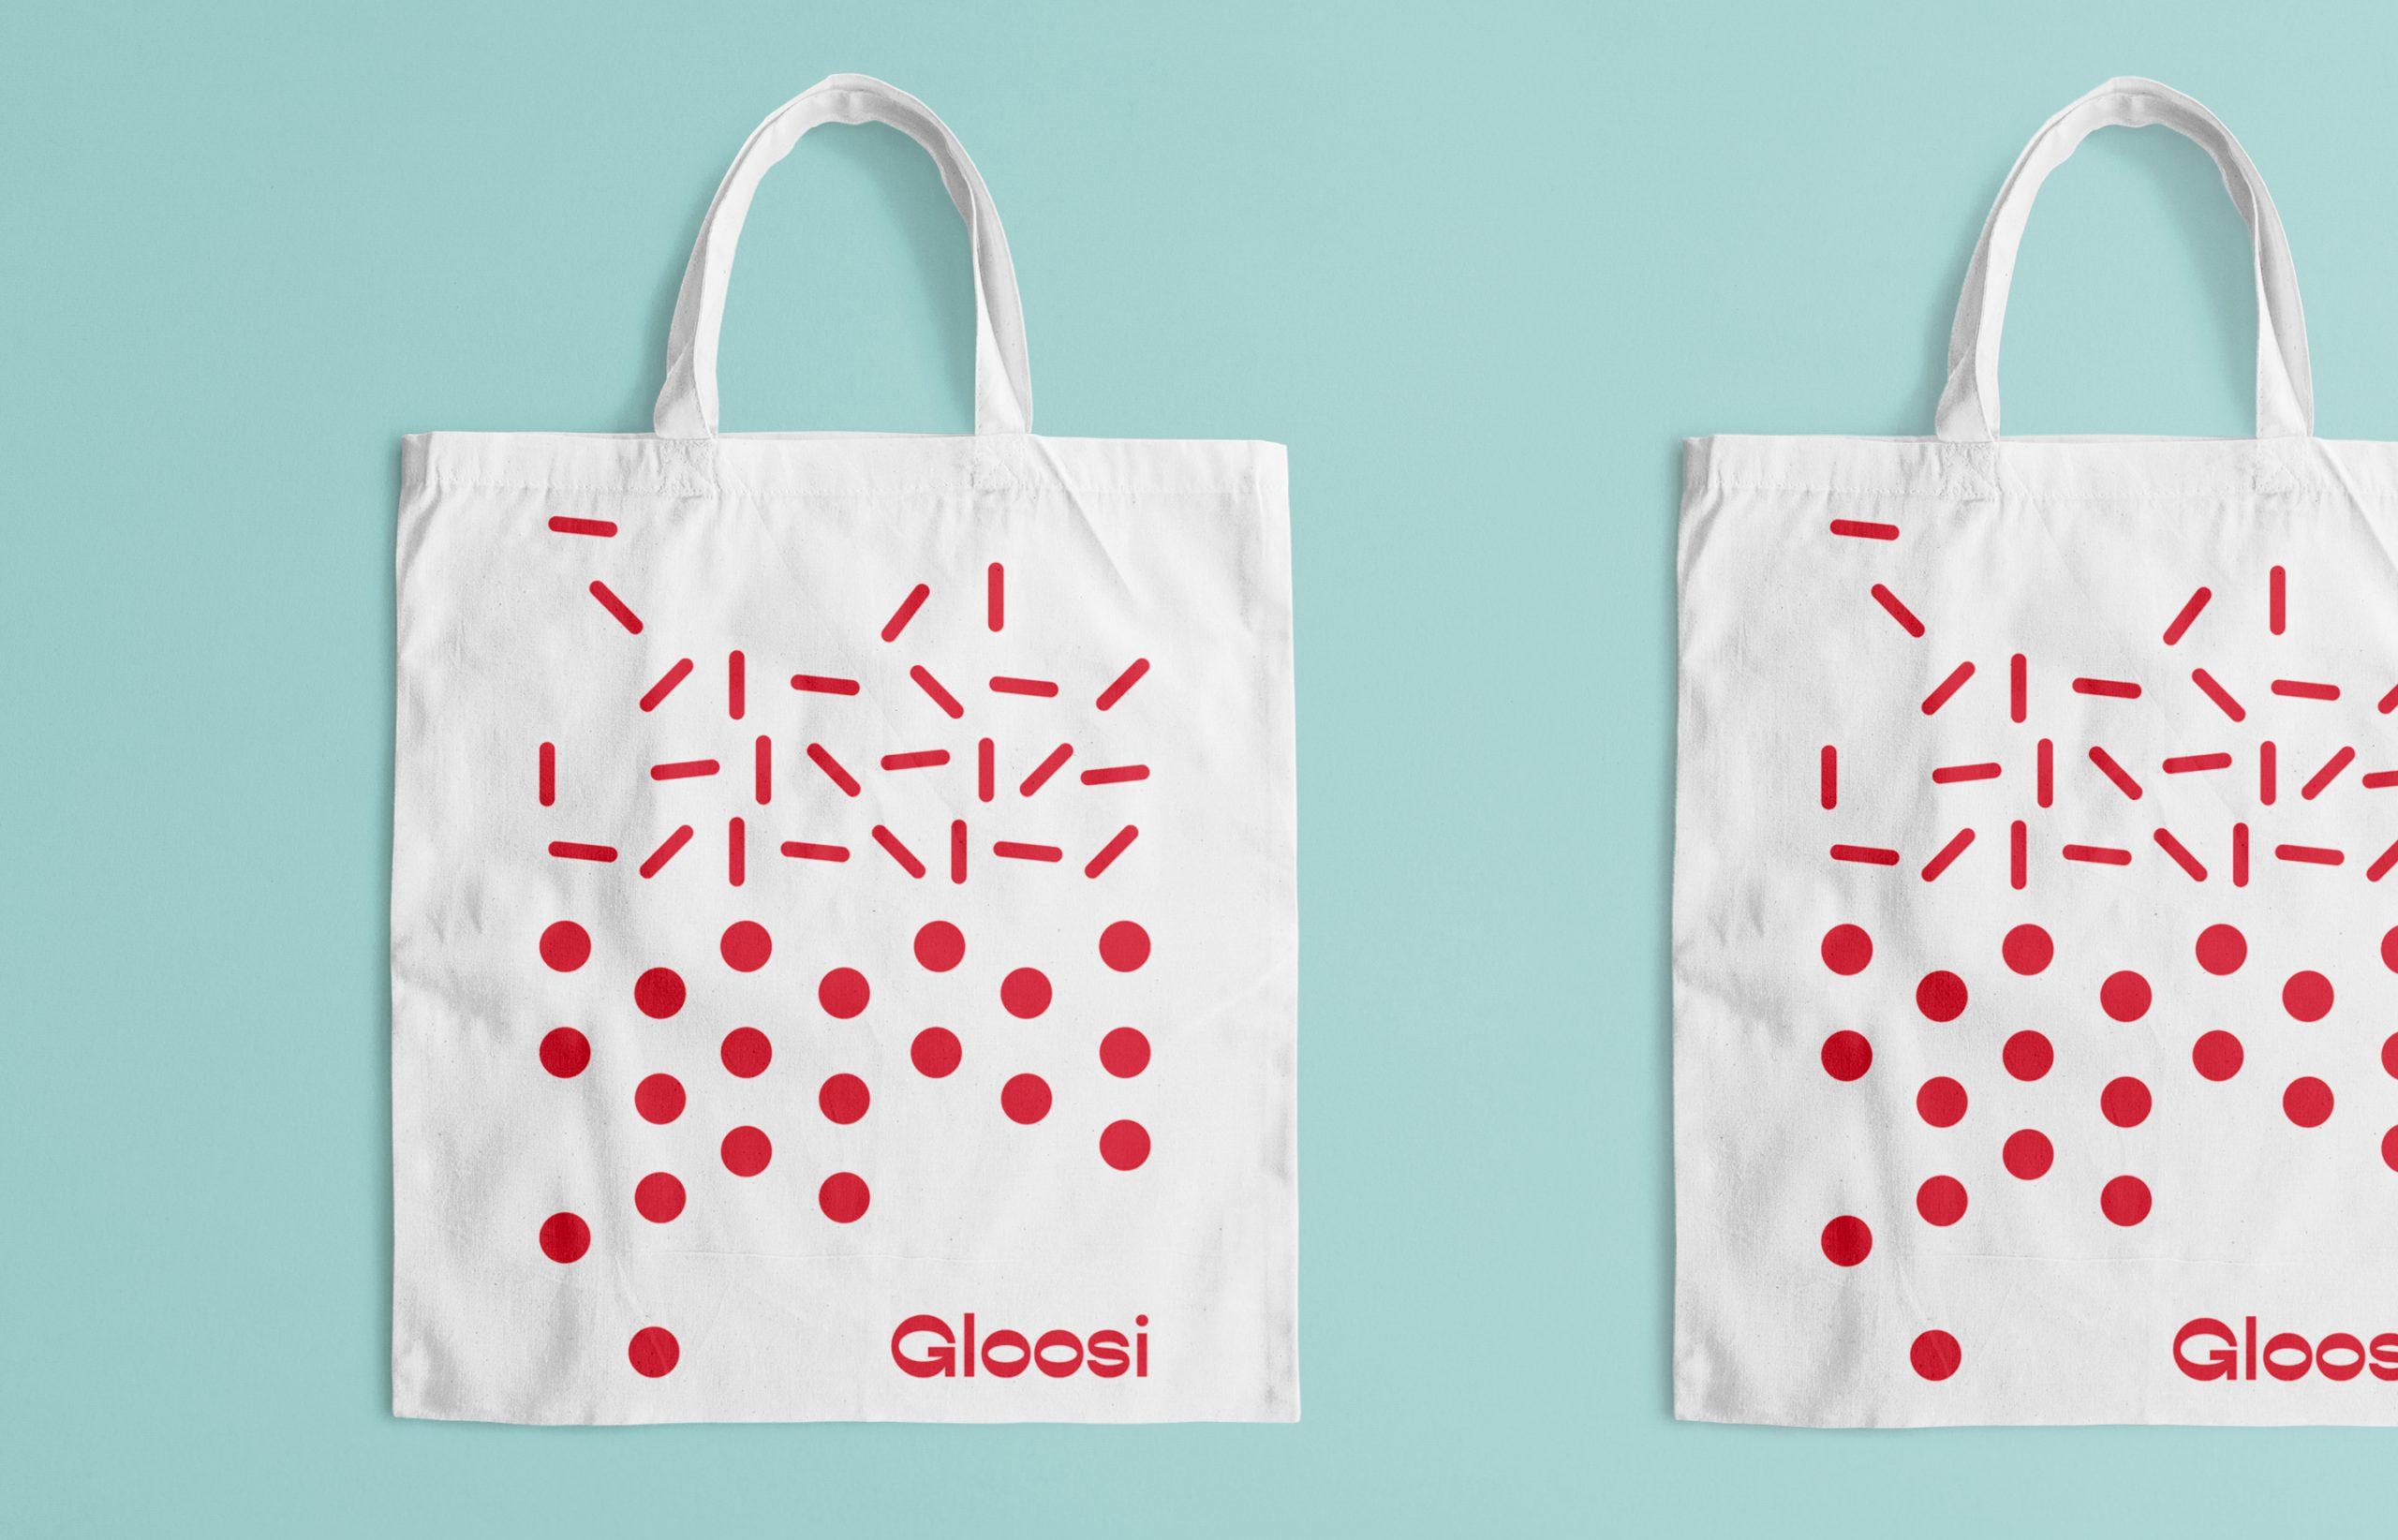 fabric_bag_Gloosi_UMA_20